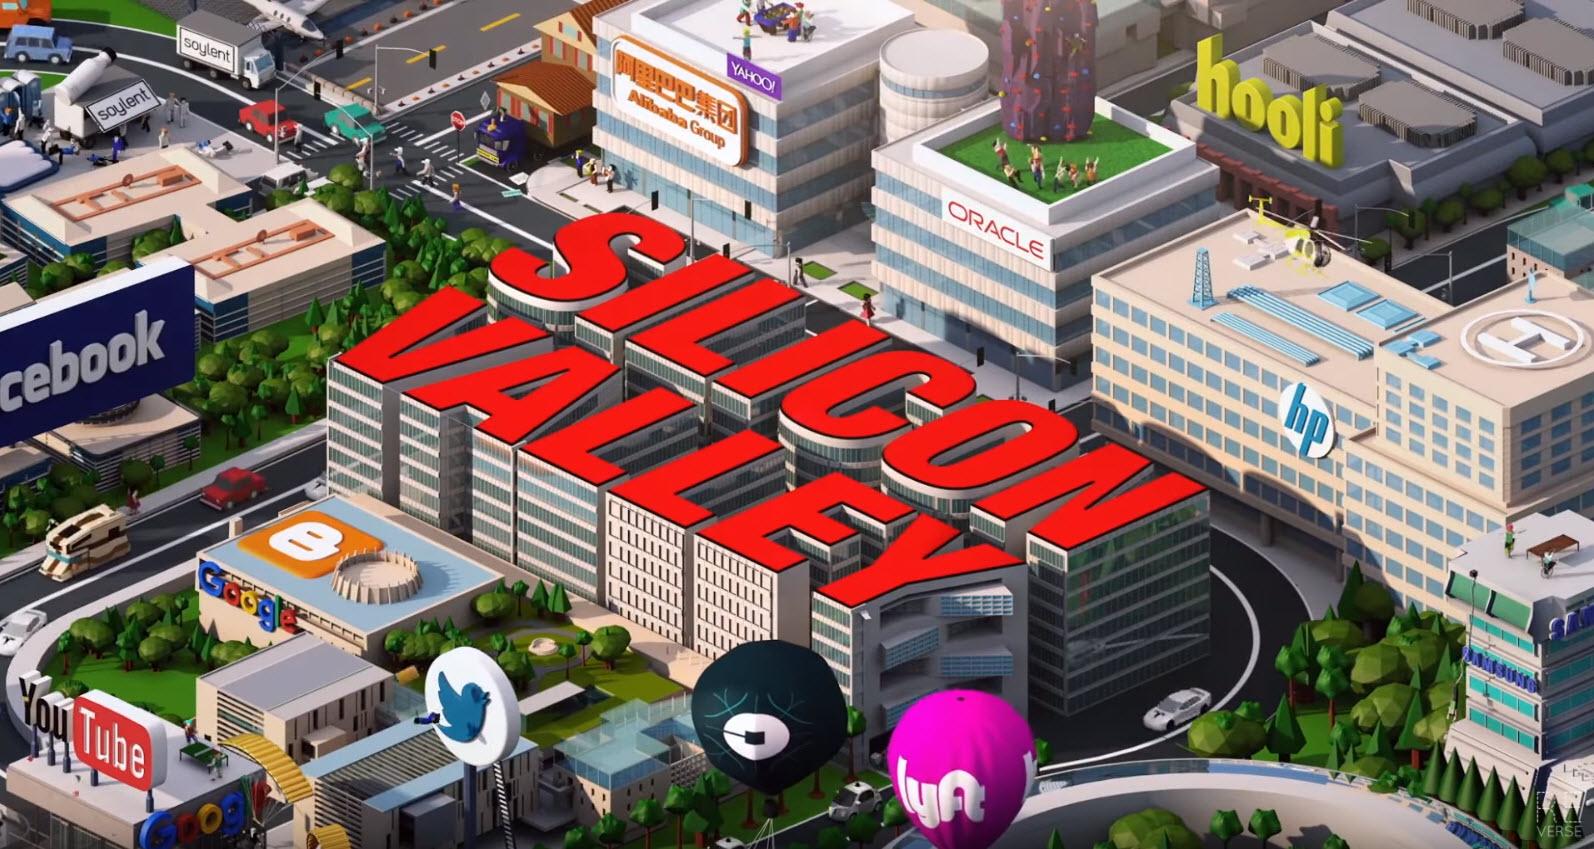 Season 4 - New startups: Airbnb, Dropbox, LinkedIn, Nest, Paypal, Pinterest, Reddit, Slack, Samsung, Snapchat, Theranos, Twitch, Vine, YelpHidden jokes: Amazon drone delivering a pizza, Uber & Lyft fighting, Soylant port-a-potties, FBI outside Theranos and Twitter's golden parachutes.